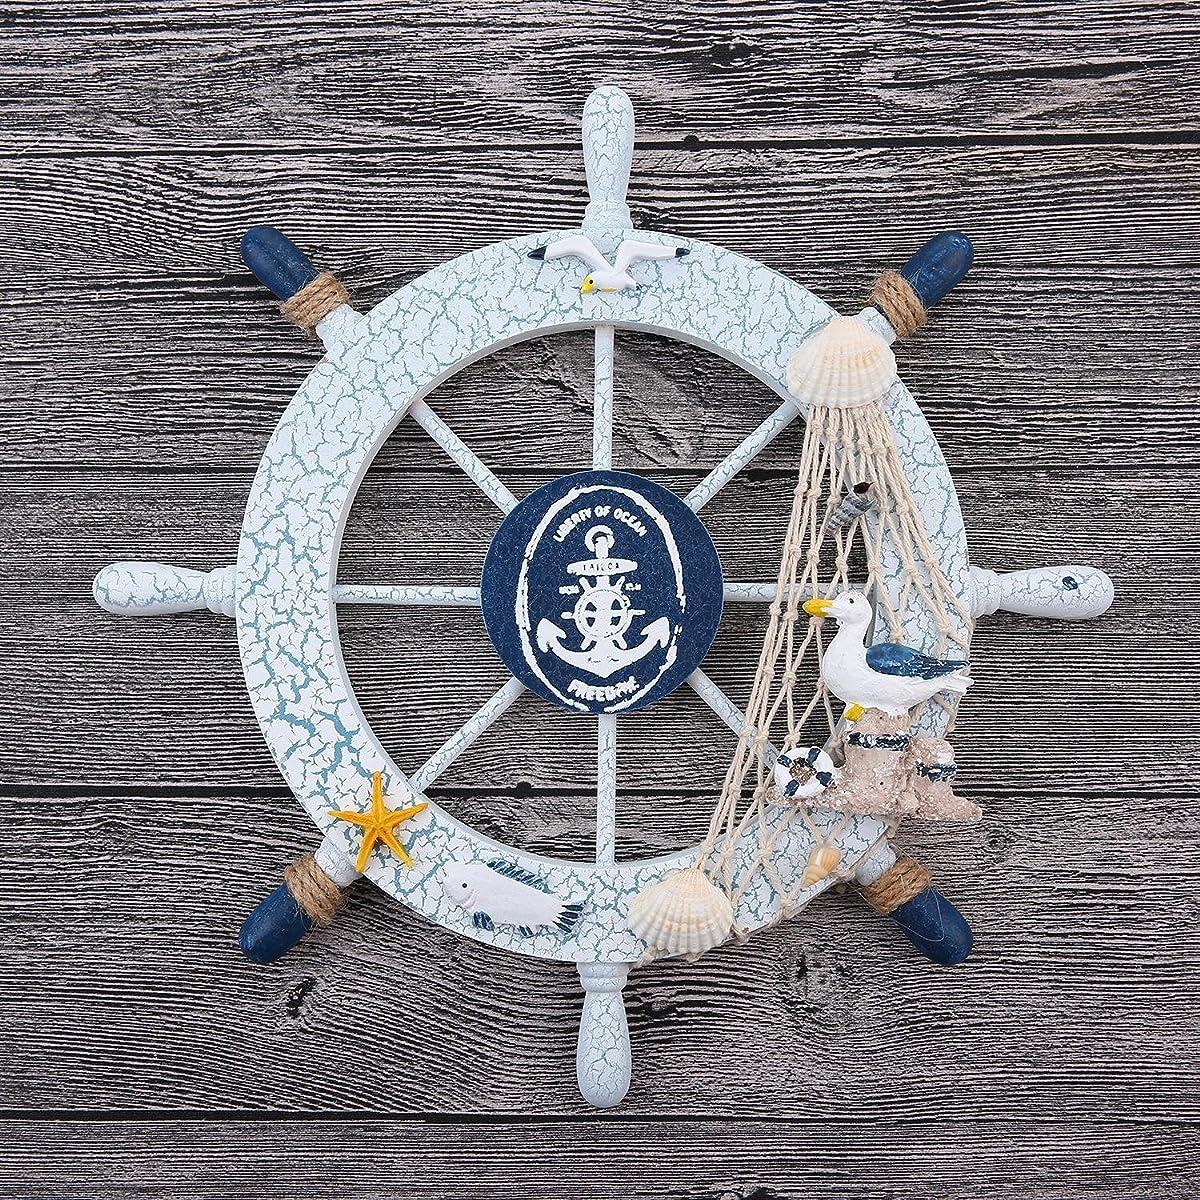 niceeshop(TM) Ornamental Home Nautical Wall Marine Decor Wood Pirate Ship Helm Wheel (Seabirds-Diameter:28cm/11inch)